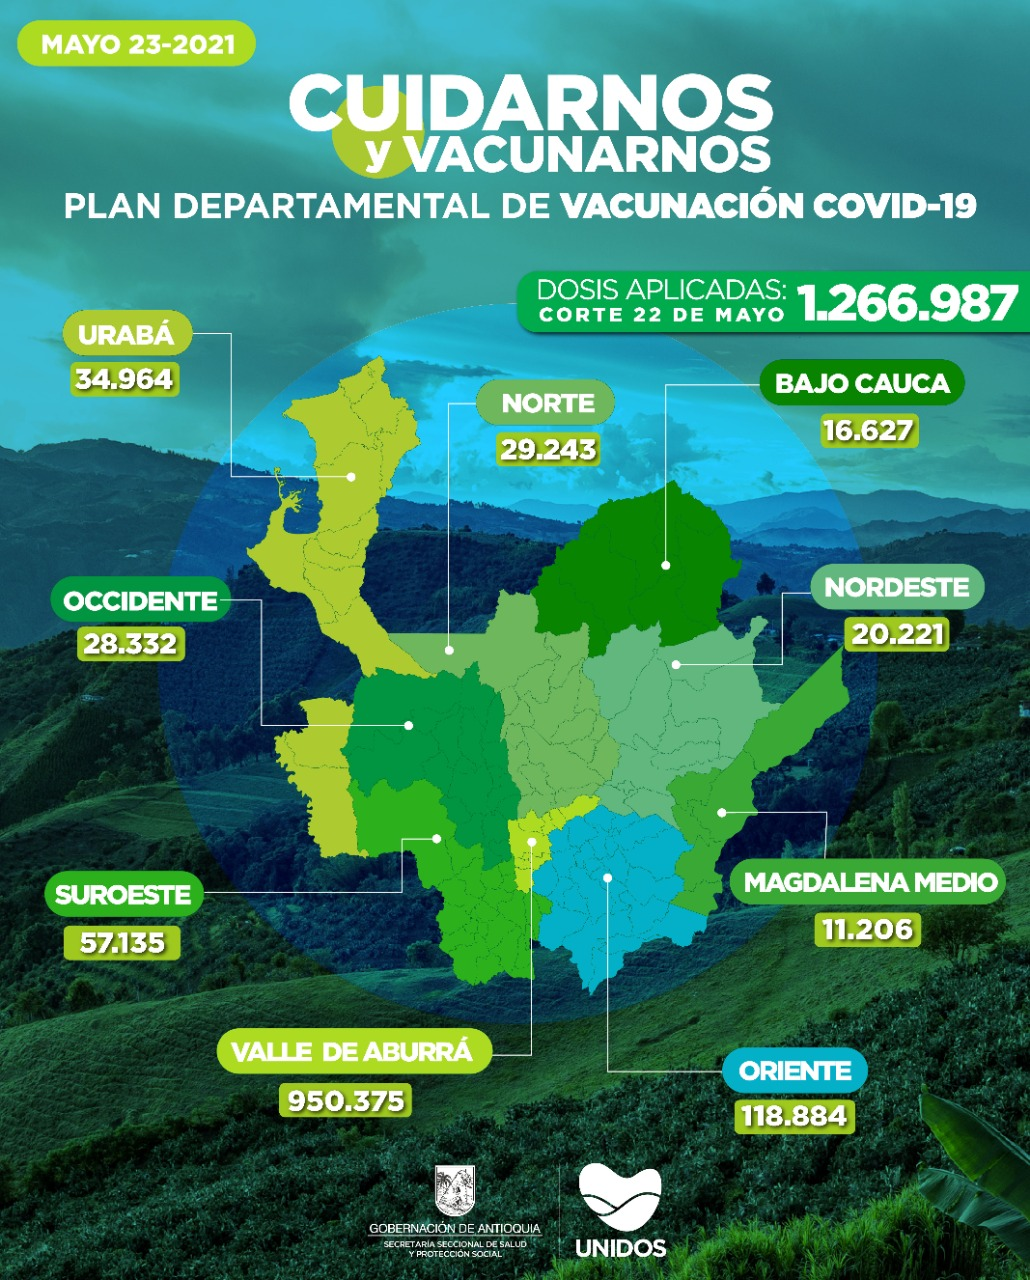 vacunados-Covid-19-Antioquia